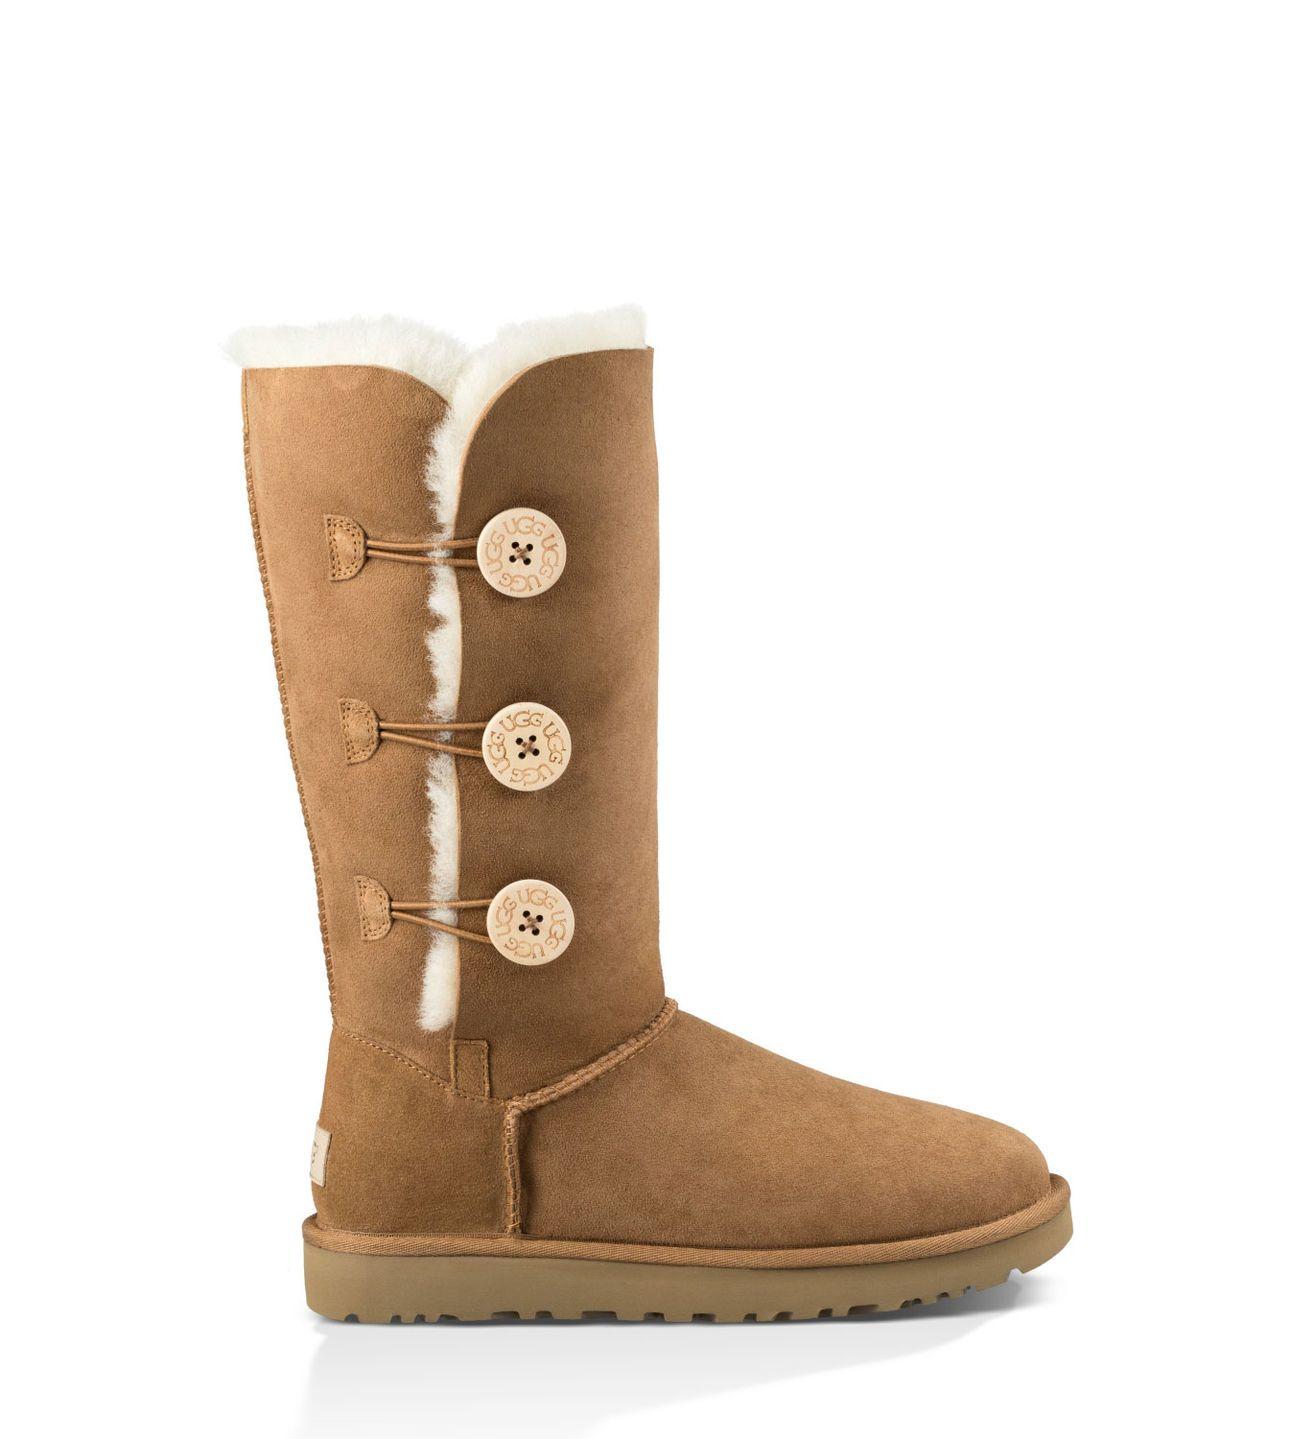 Womens Boots UGG Bailey Button Triplet Sand Sheepskin